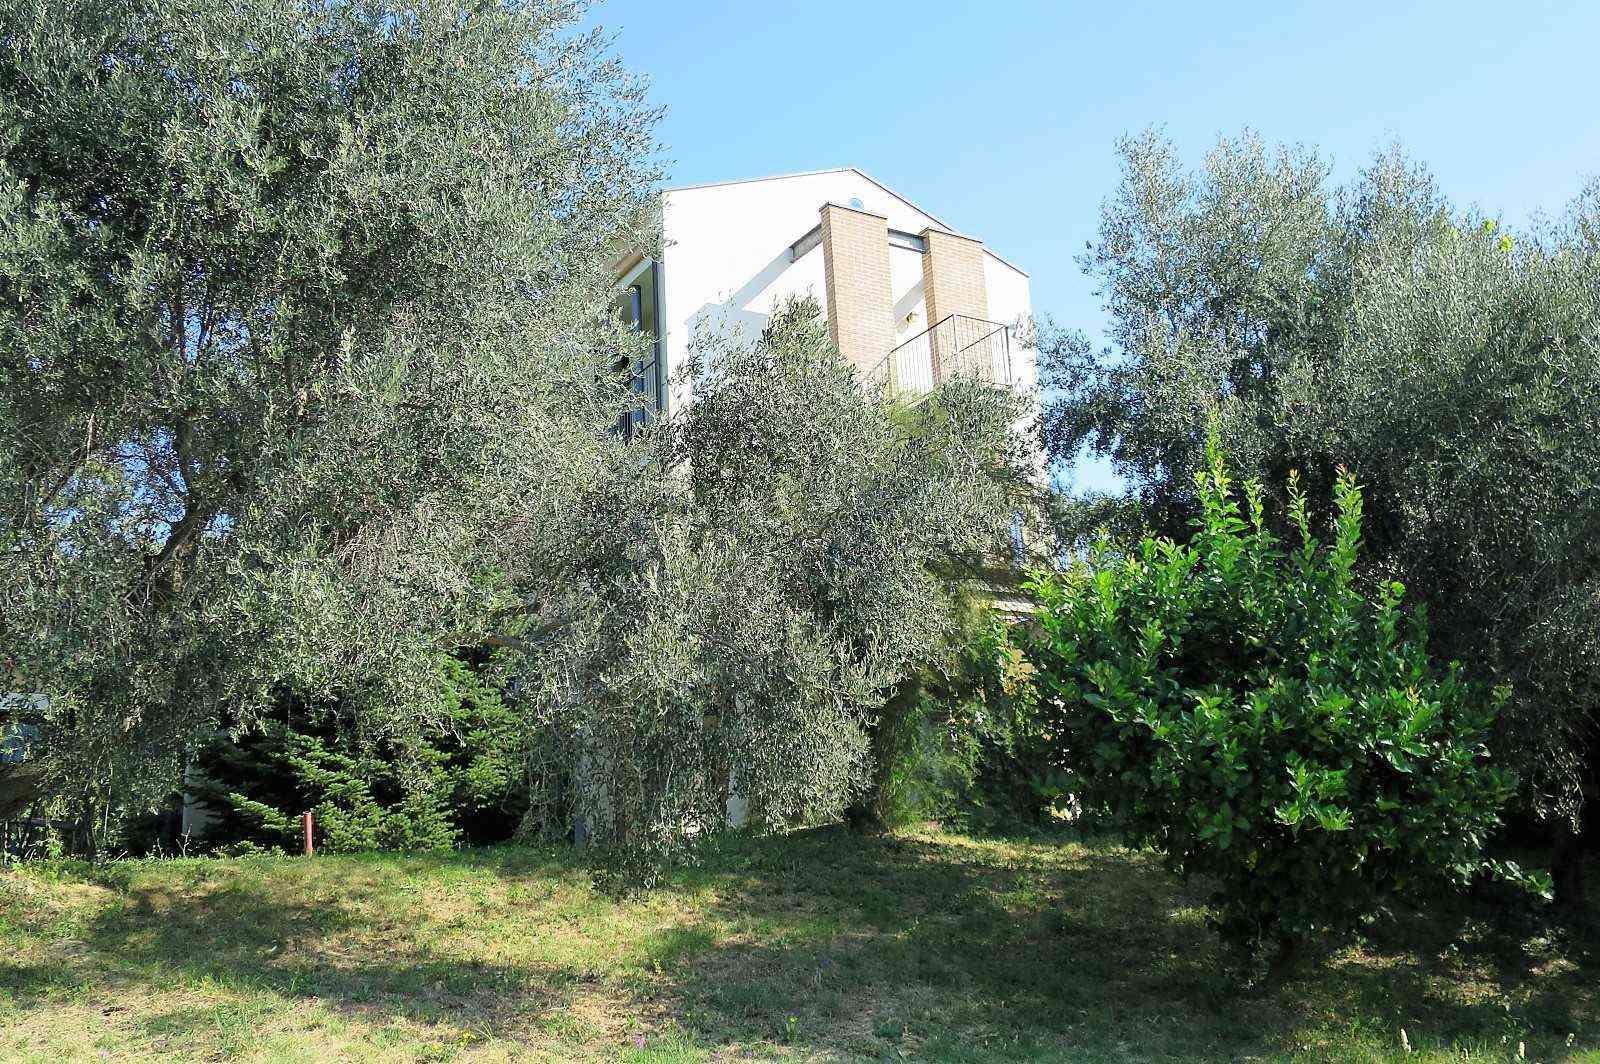 Villa Villa in vendita Atri (TE), Villa Paola - Atri - EUR 473.281 310